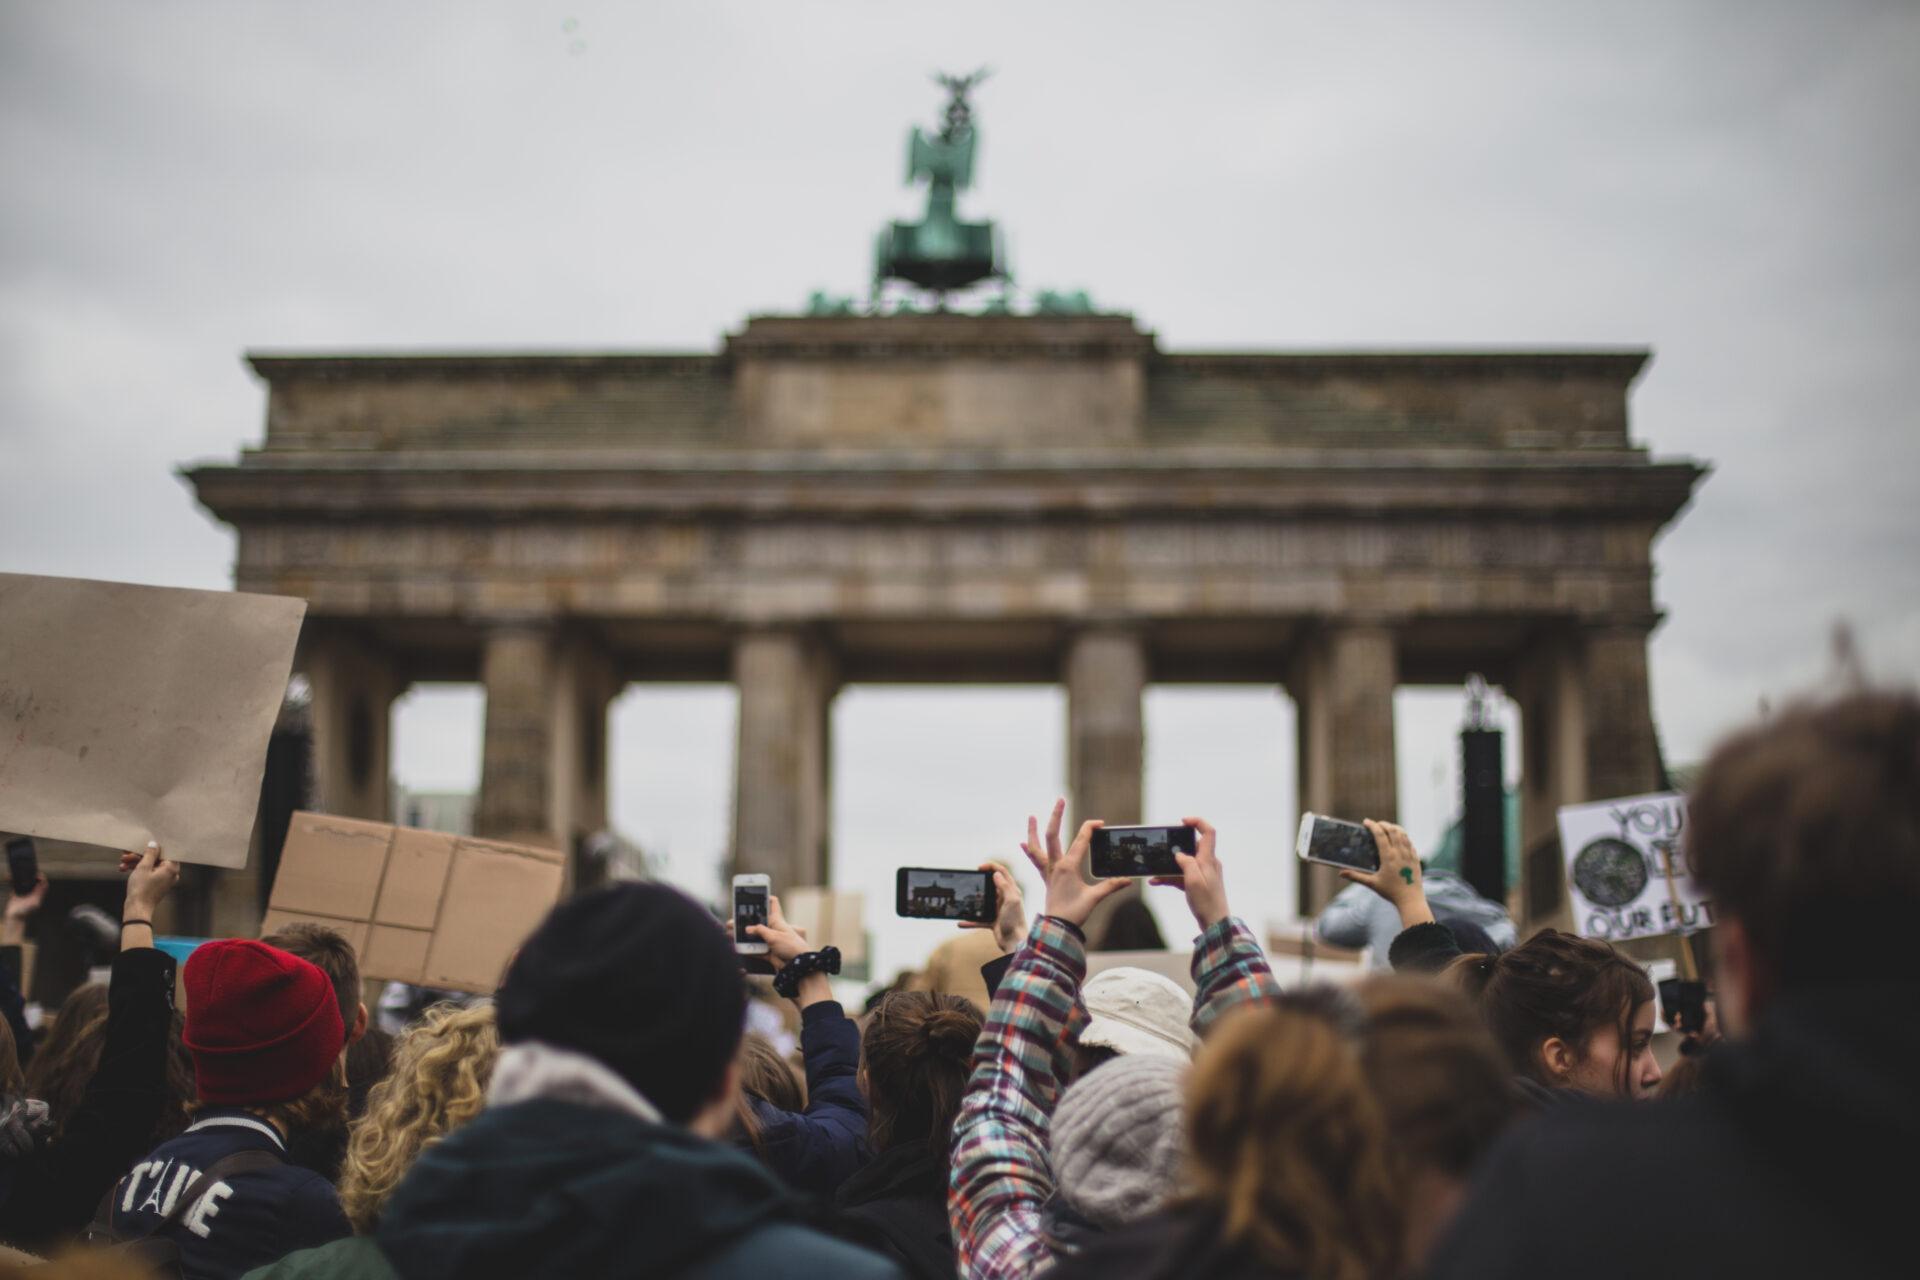 Germany_Brandenburger-Tor_Fridays-for_Future_8826_Carolin-Weinkopf